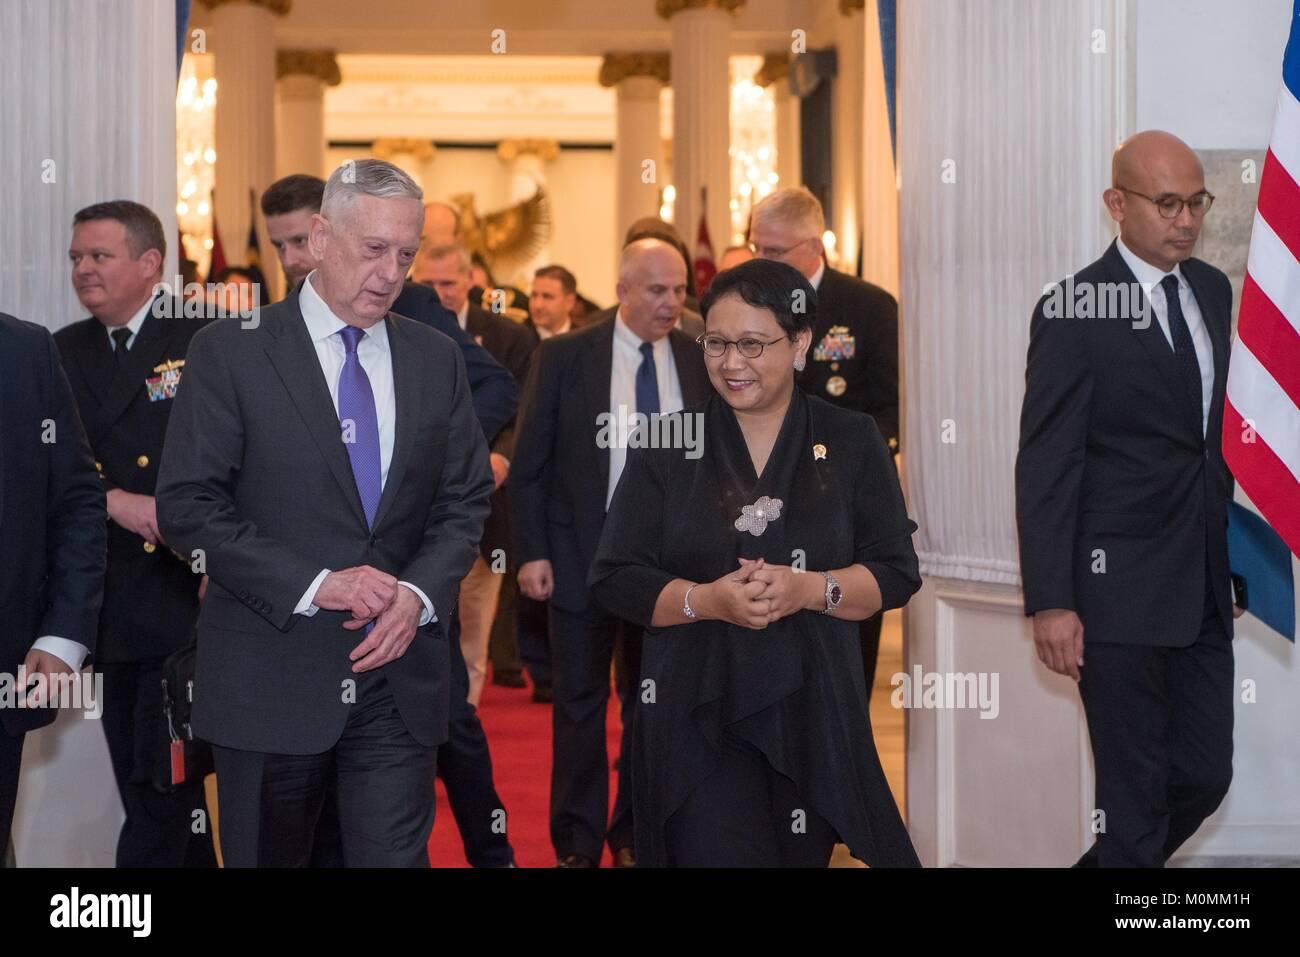 Jakarta, Indonesia. 22nd Jan, 2018. U.S. Defense Secretary James Mattis, left, walks with Indonesian Foreign Minister - Stock Image